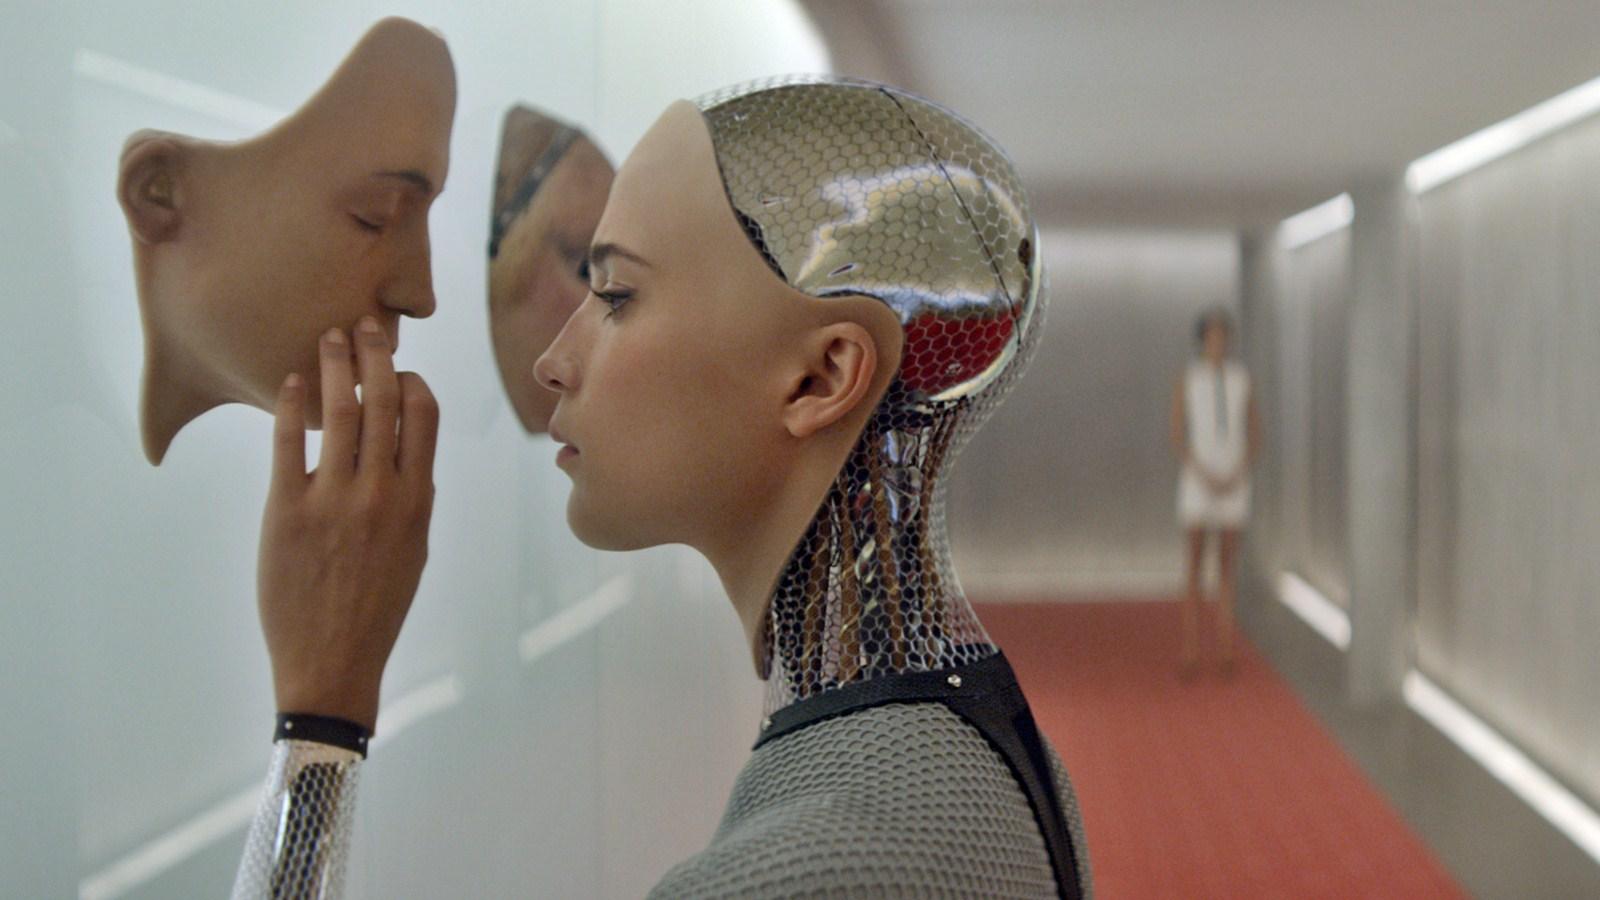 Секс с роботом скоро станет нормой